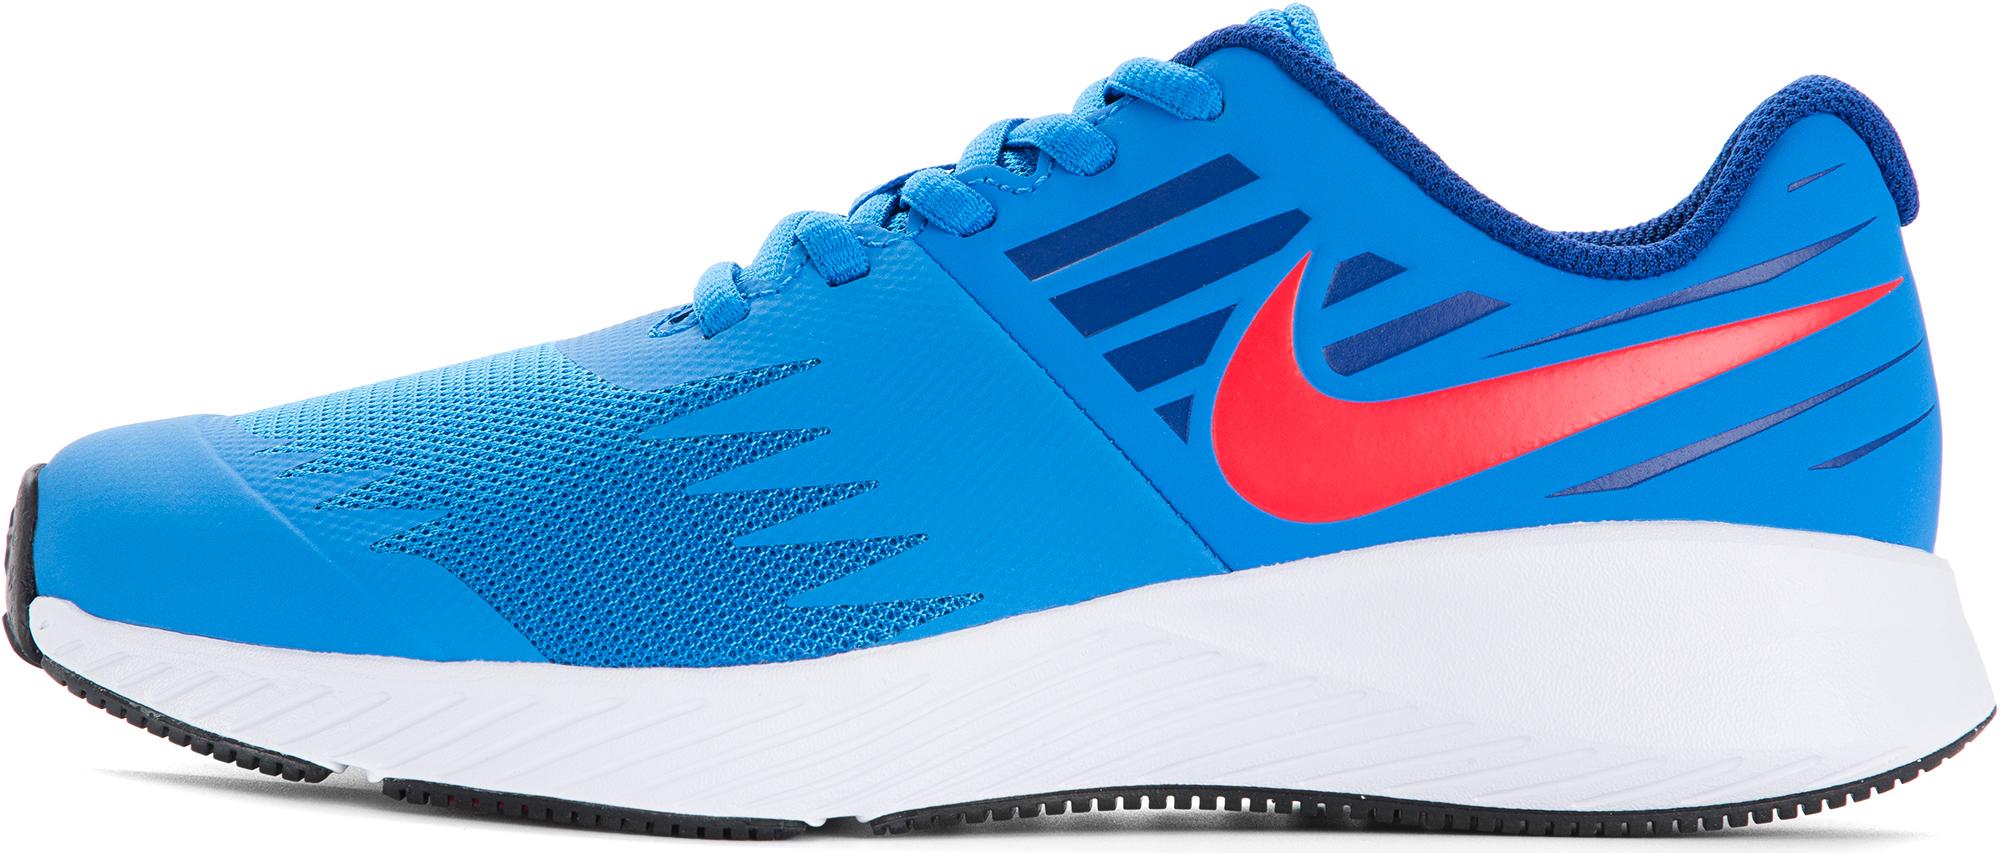 Nike Кроссовки для мальчиков Nike Star Runner, размер 39